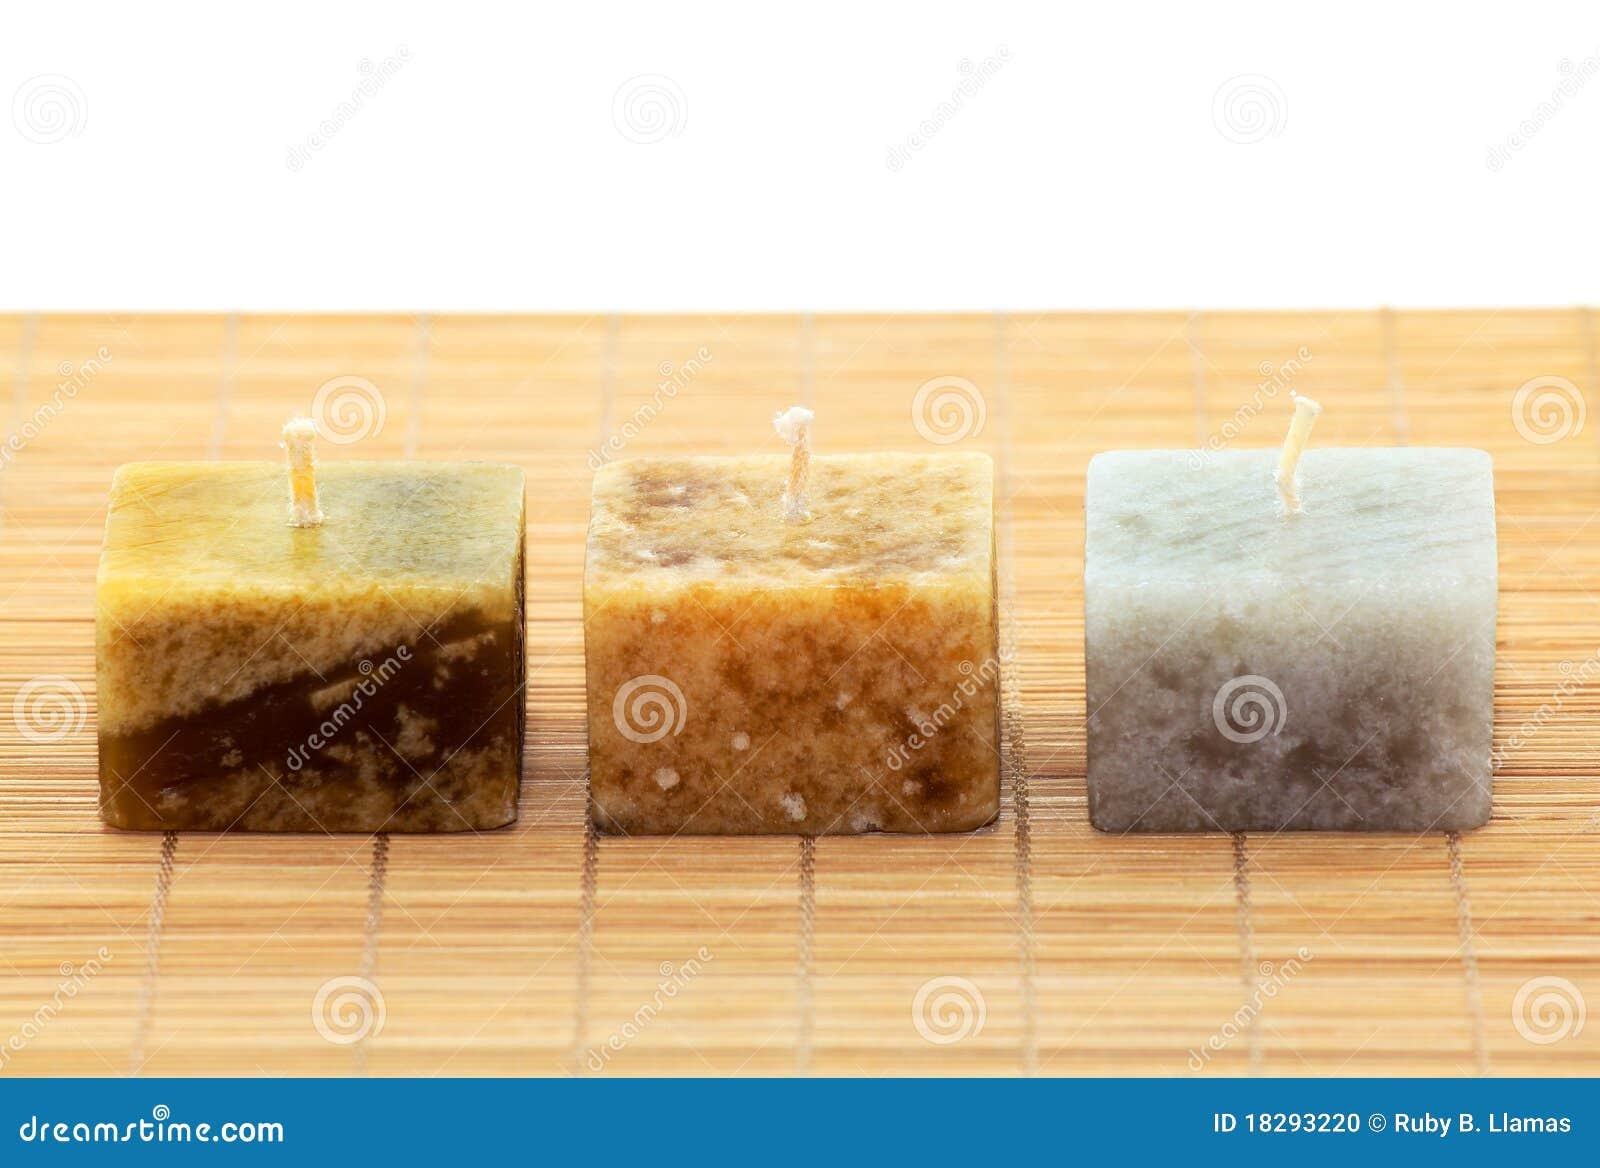 Three Aromatic Candles